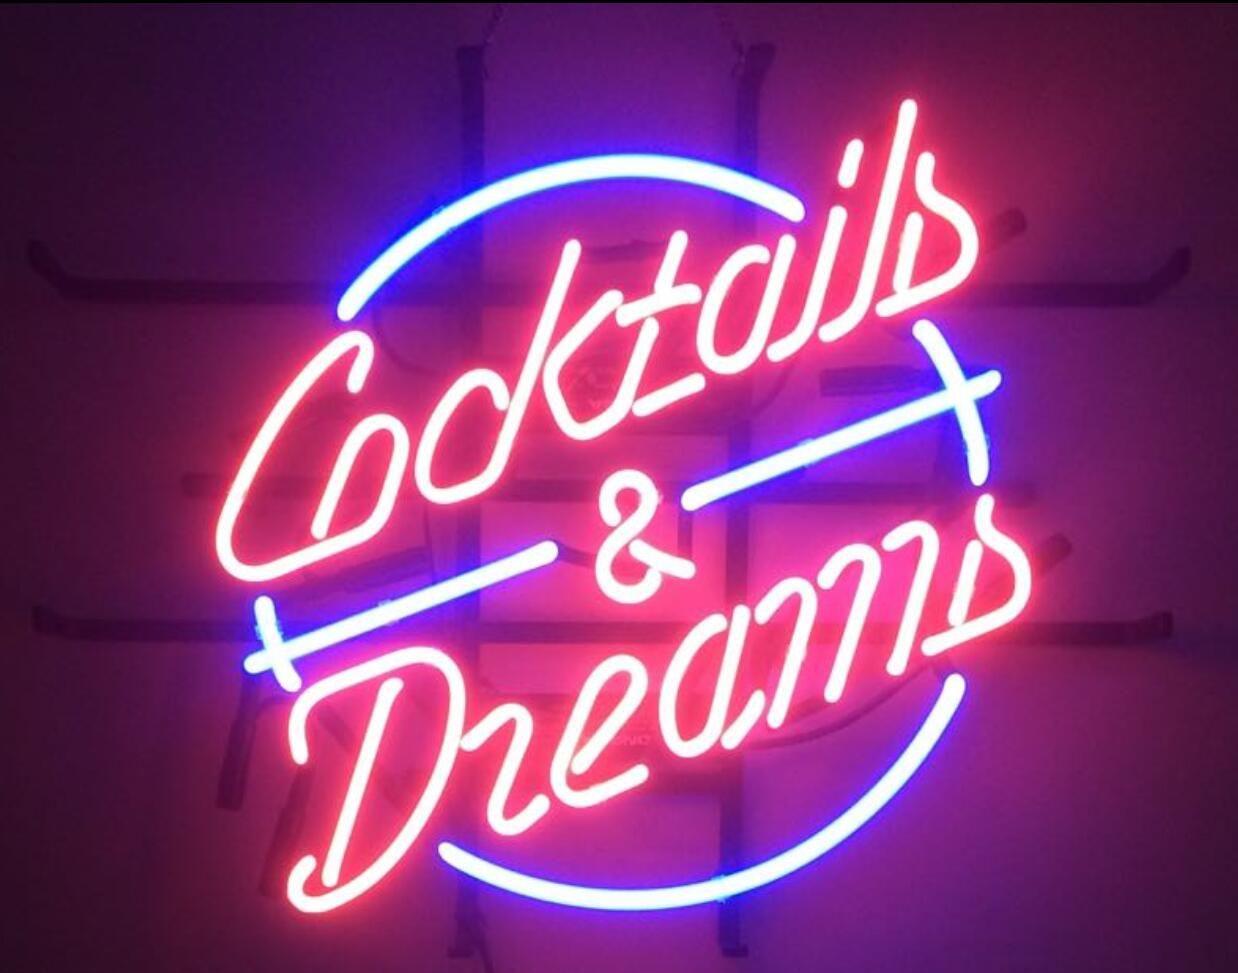 2017 new cocktails and dreams light glass neon sign light. Black Bedroom Furniture Sets. Home Design Ideas